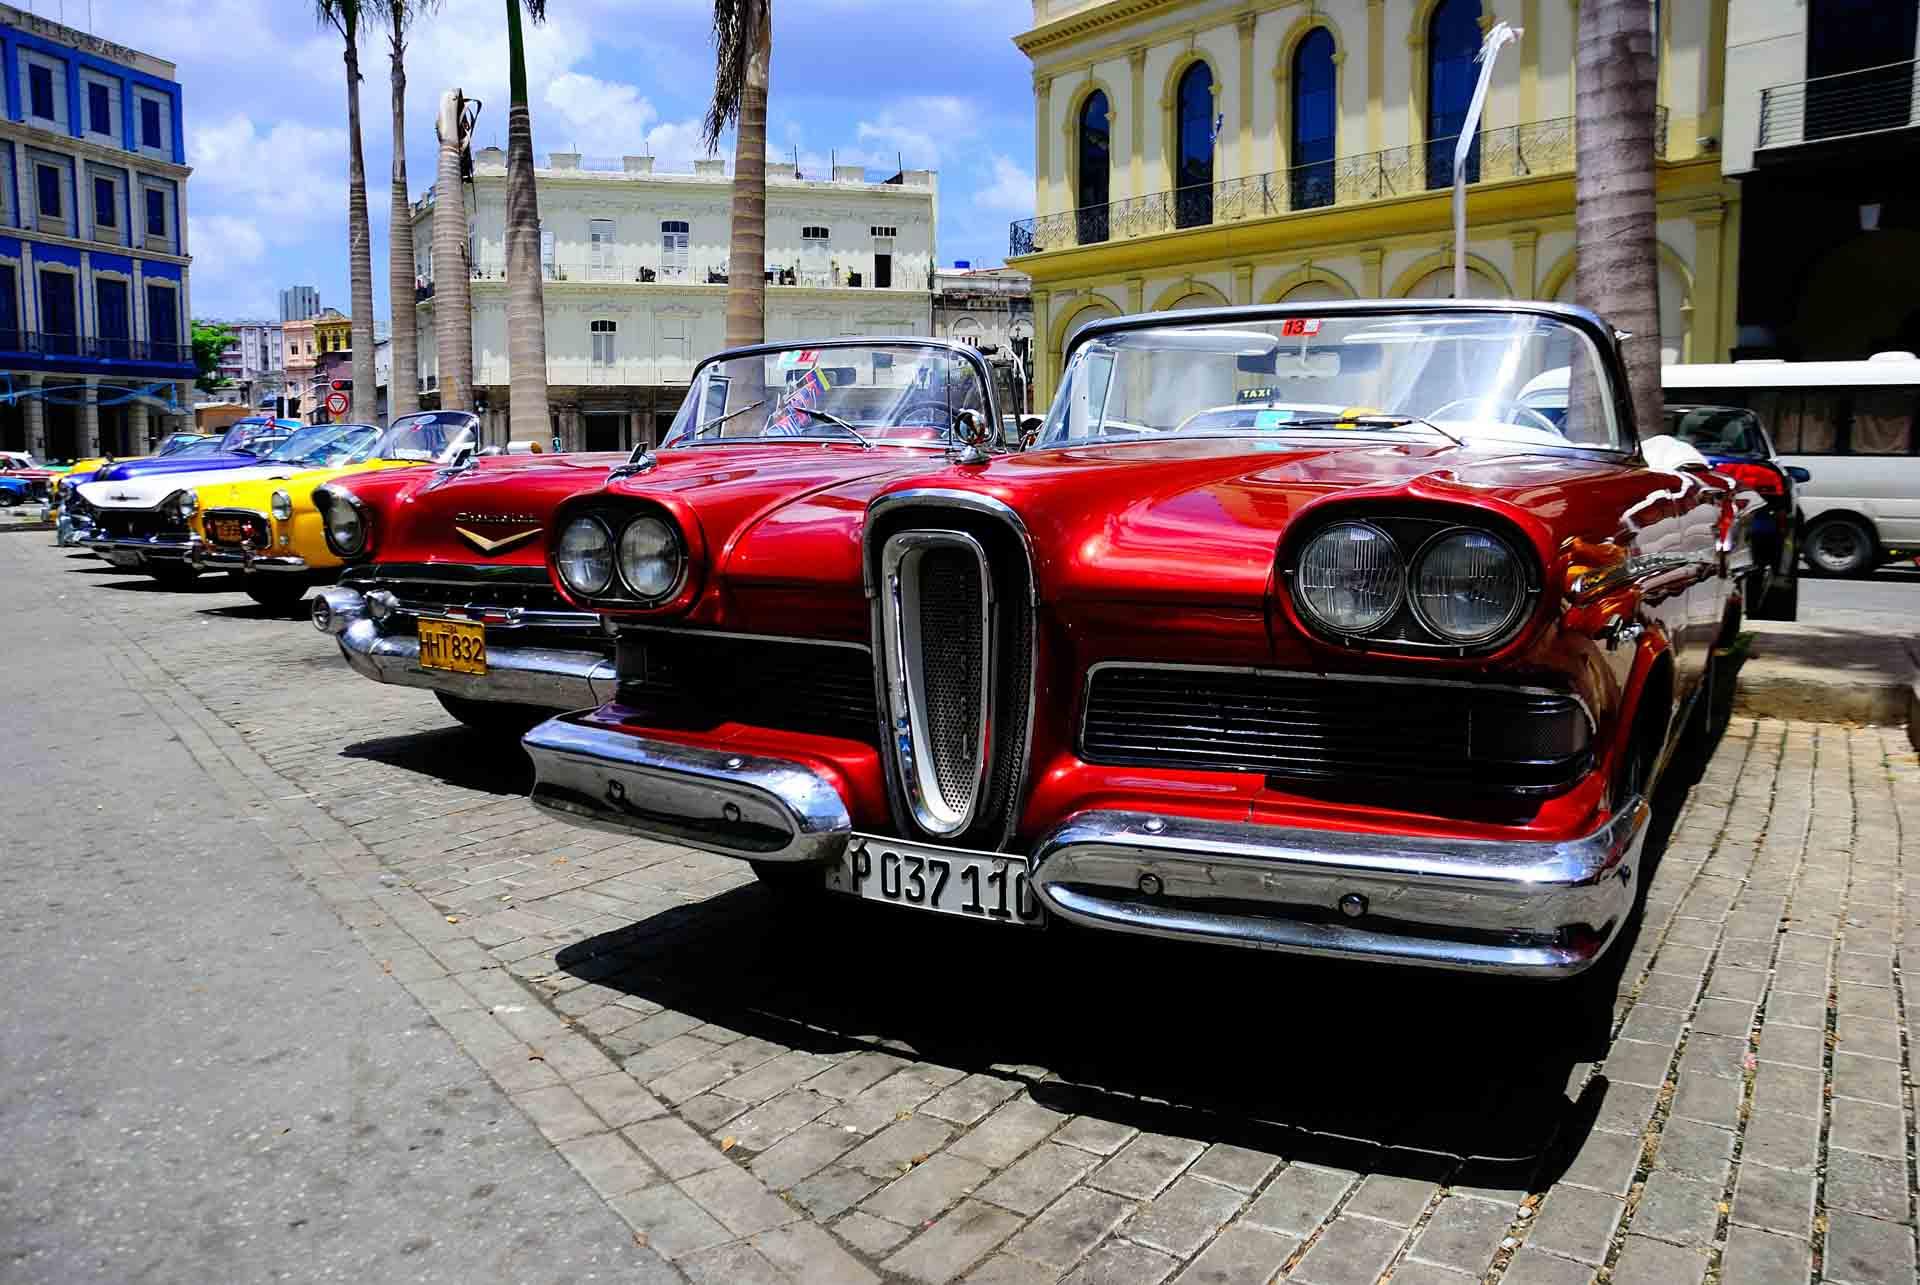 Havana Cuba Vintage Car 1 - PescArt - Enrico Pescantini